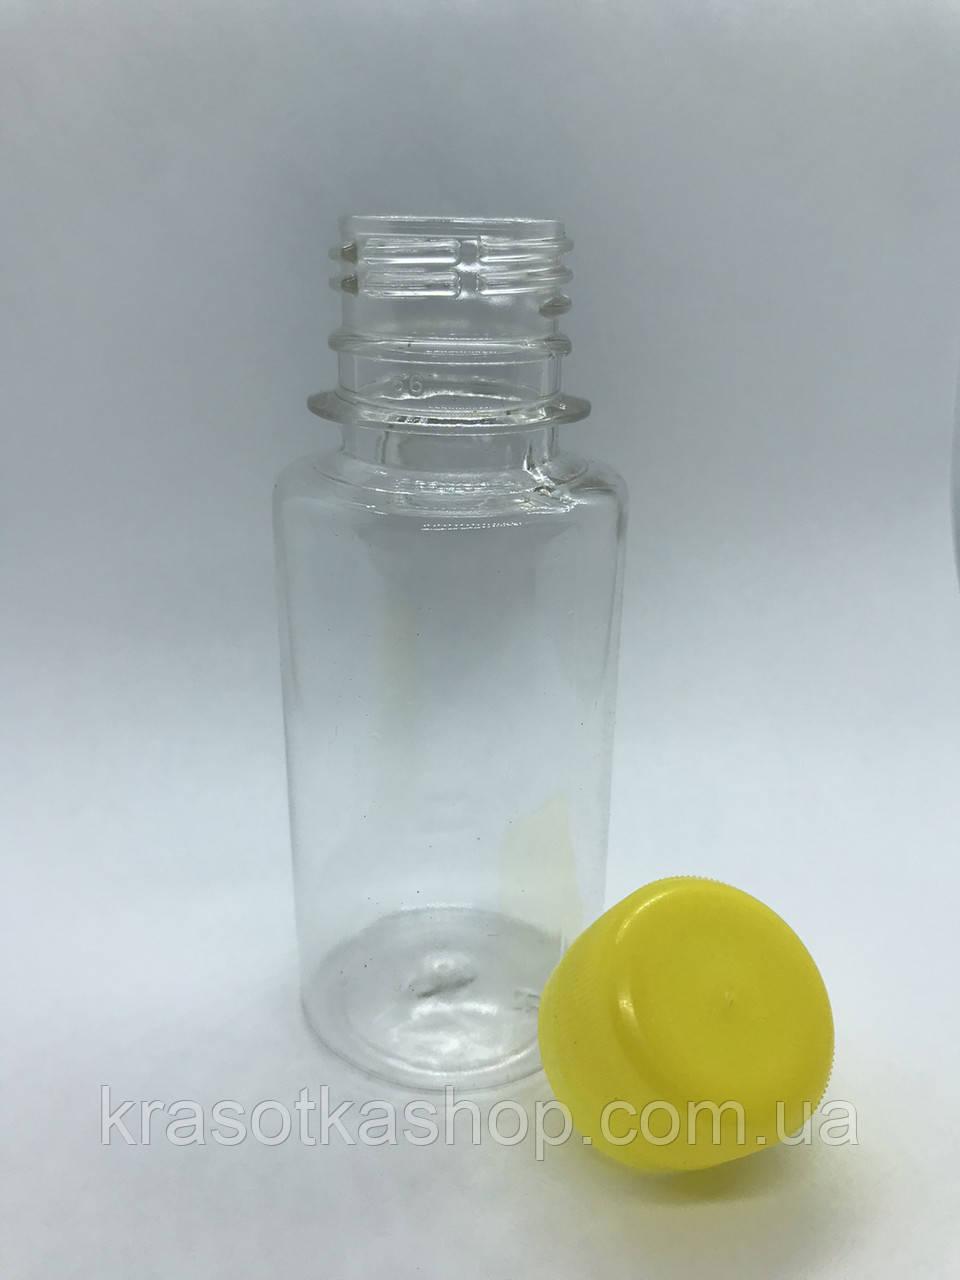 Пляшечка-дозатор, 100 мл